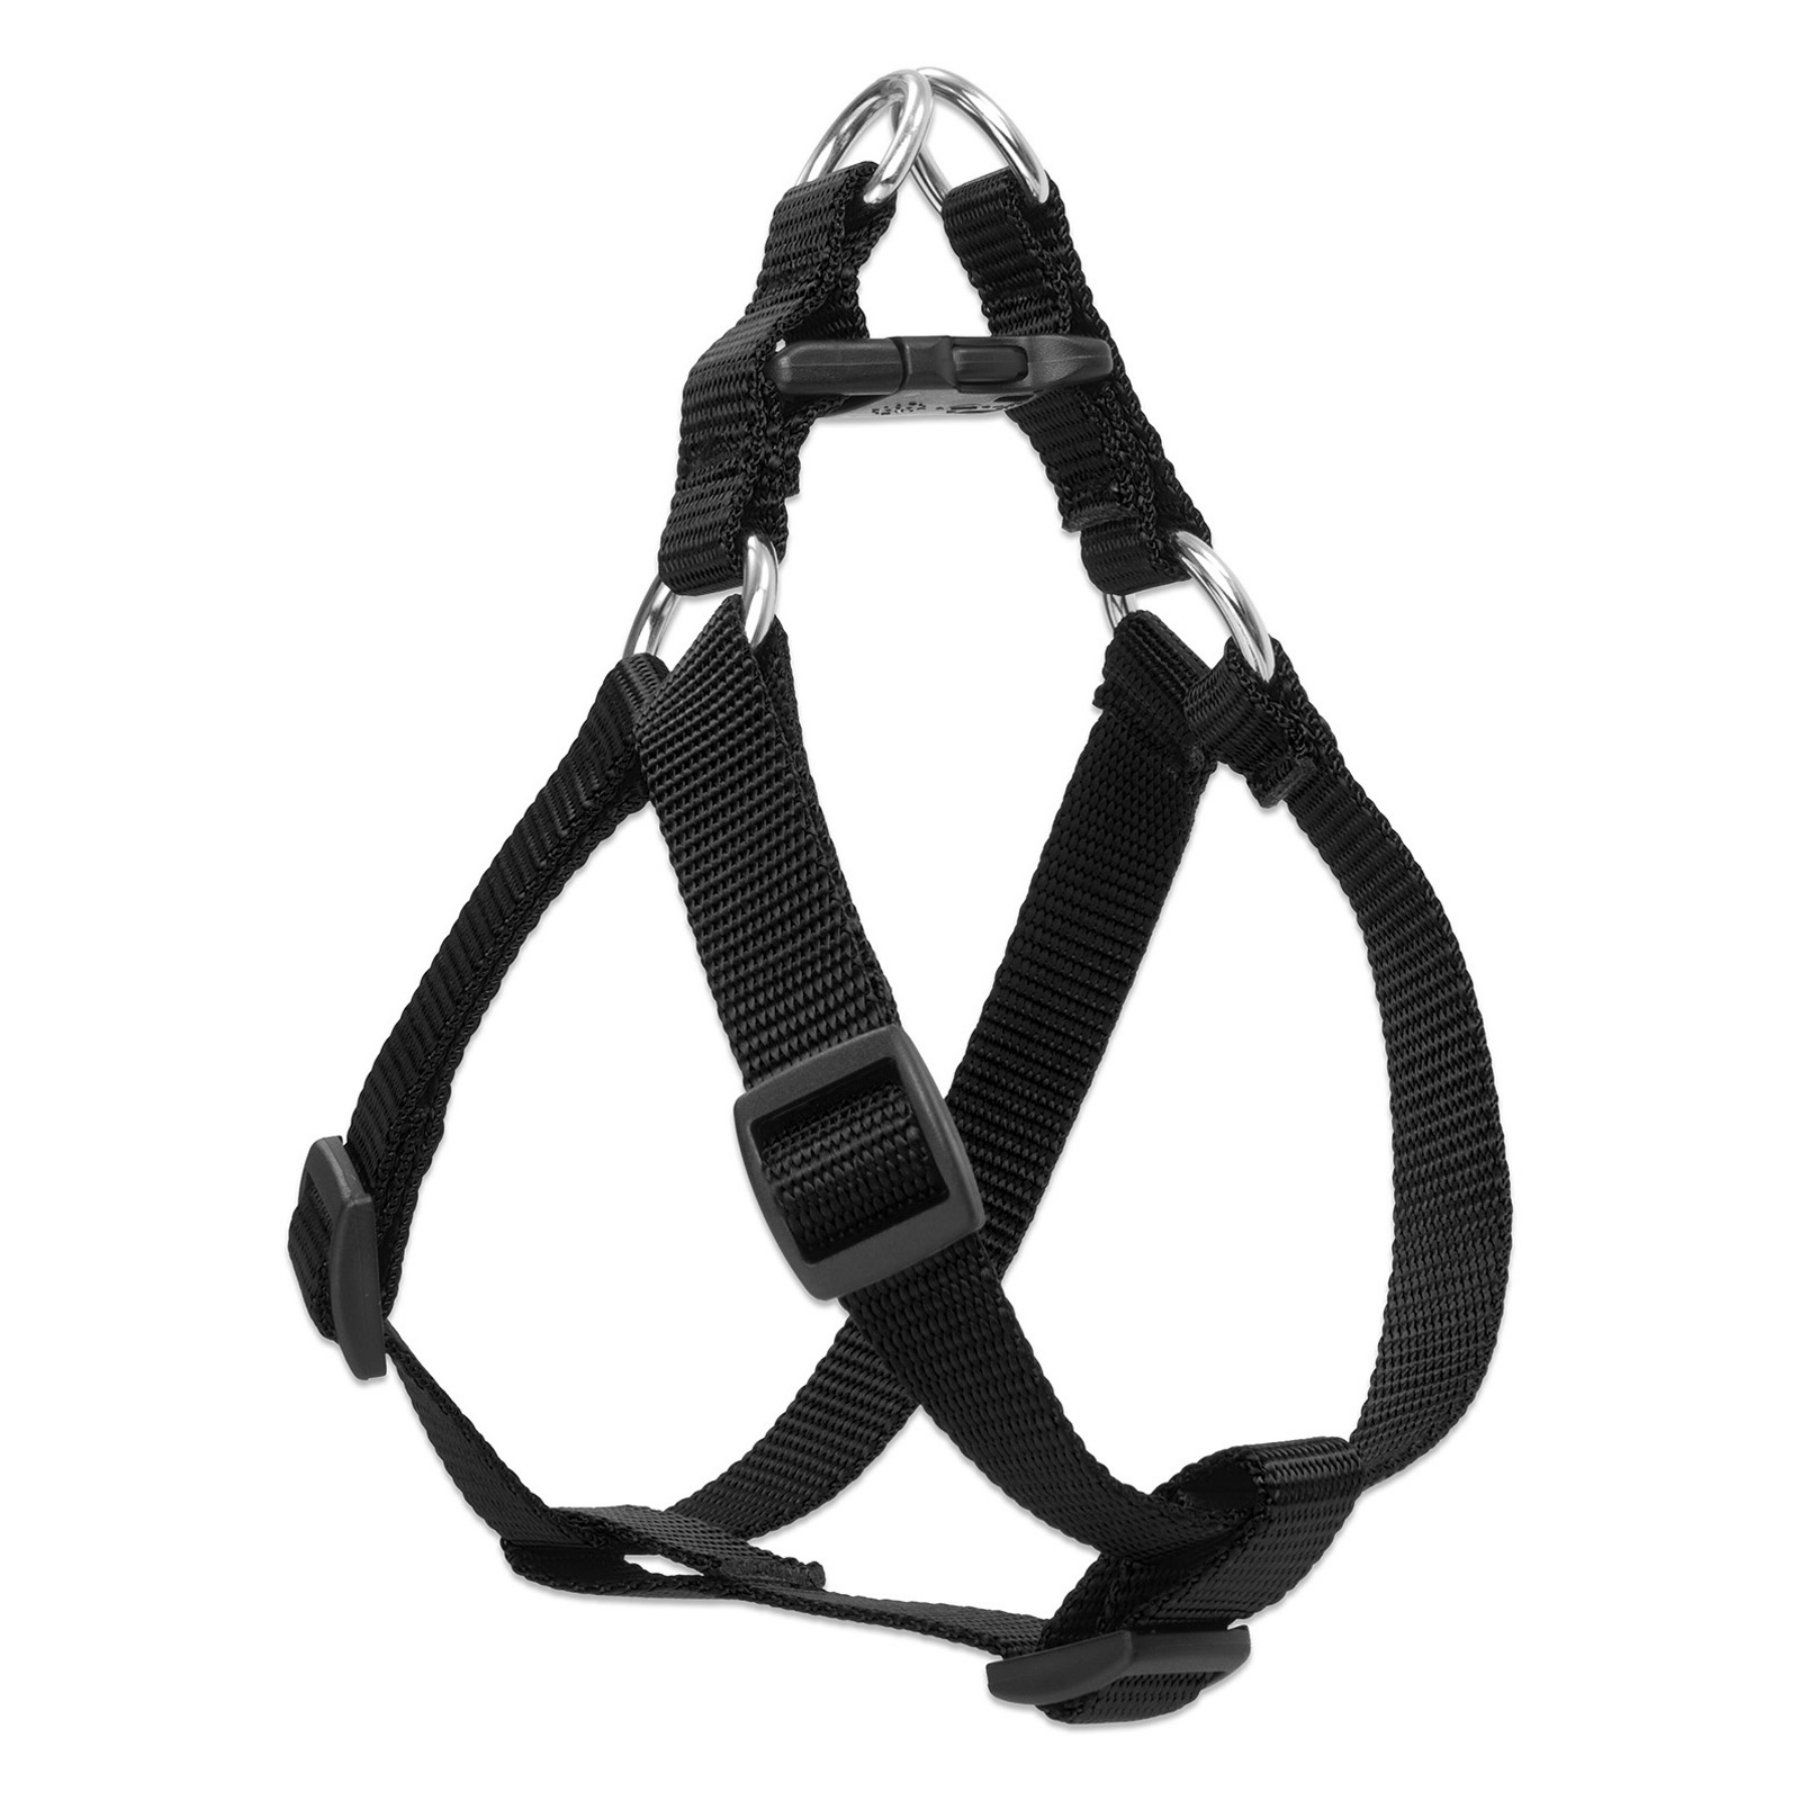 Lupine Collars Leads Dog Harness Black 0865 2125 Dog